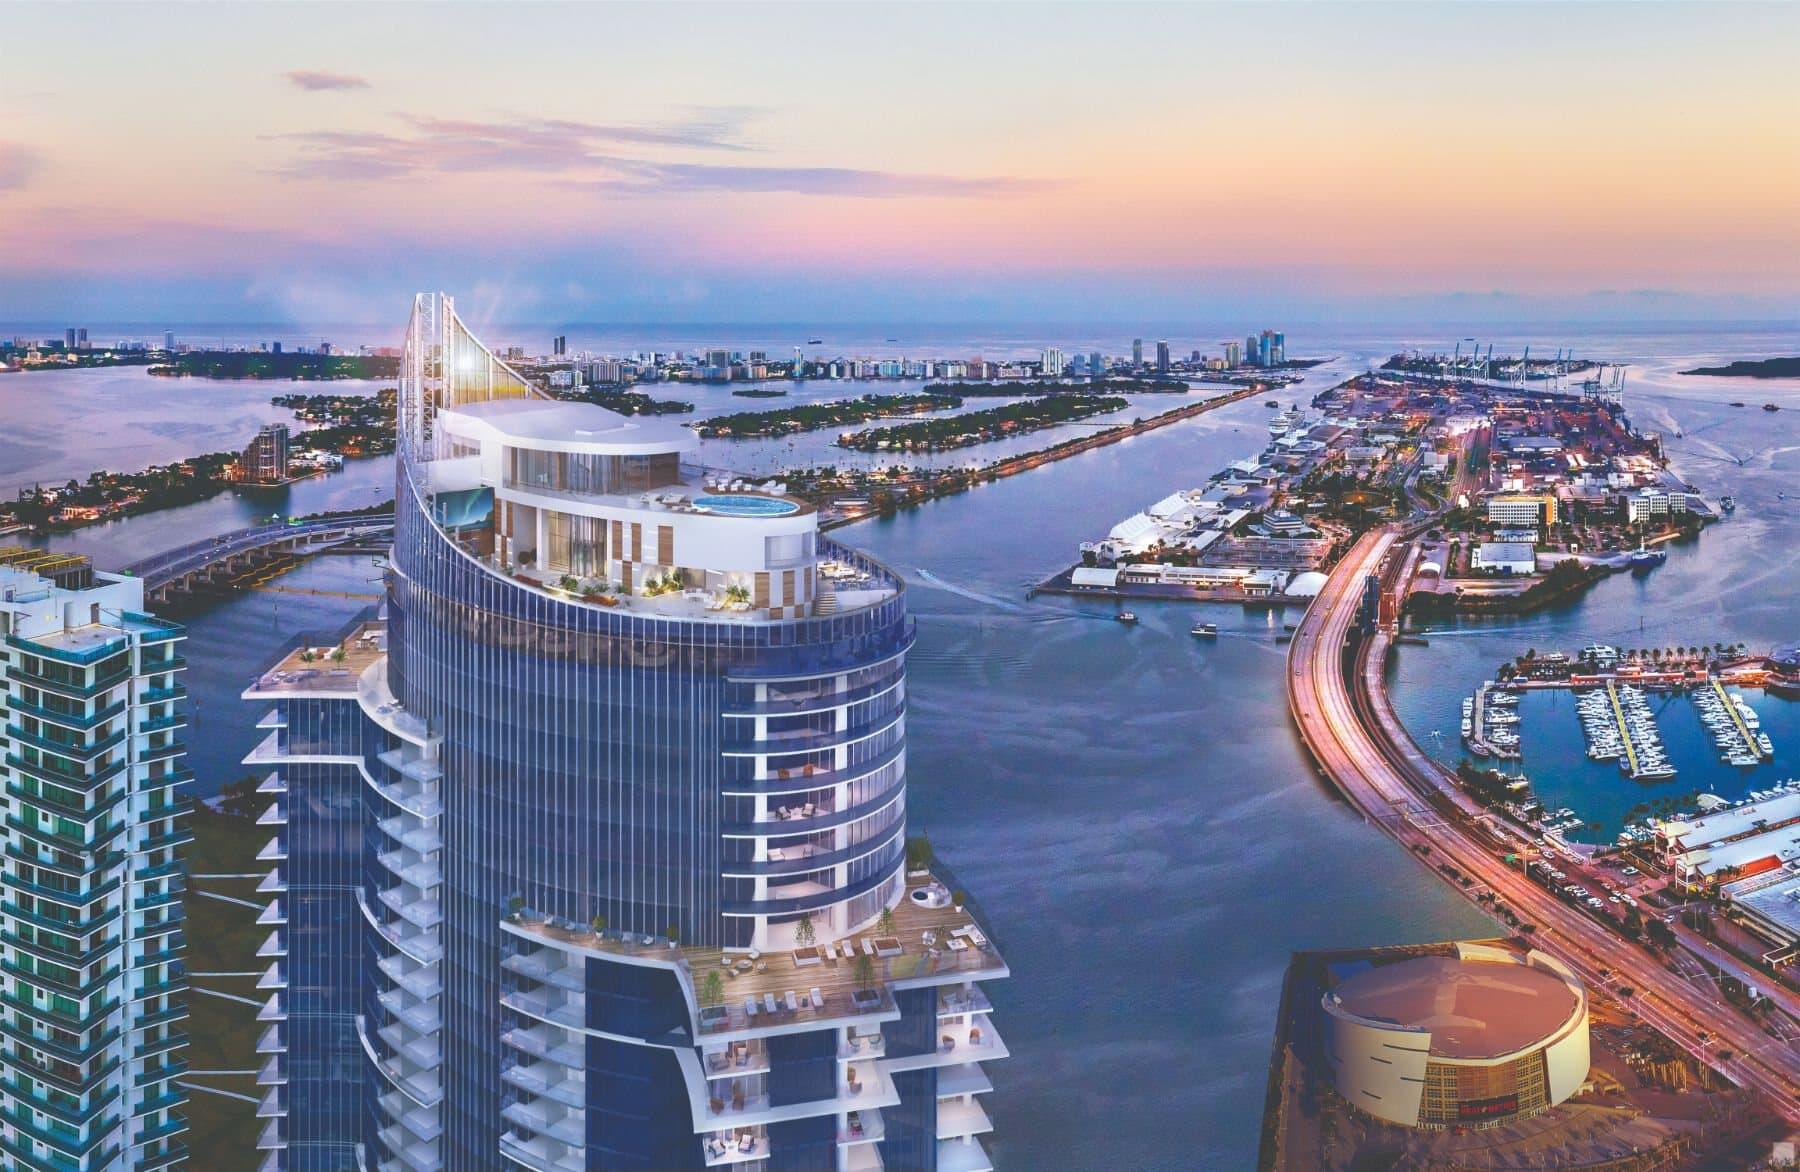 3 Paramount Miami Worldcenter